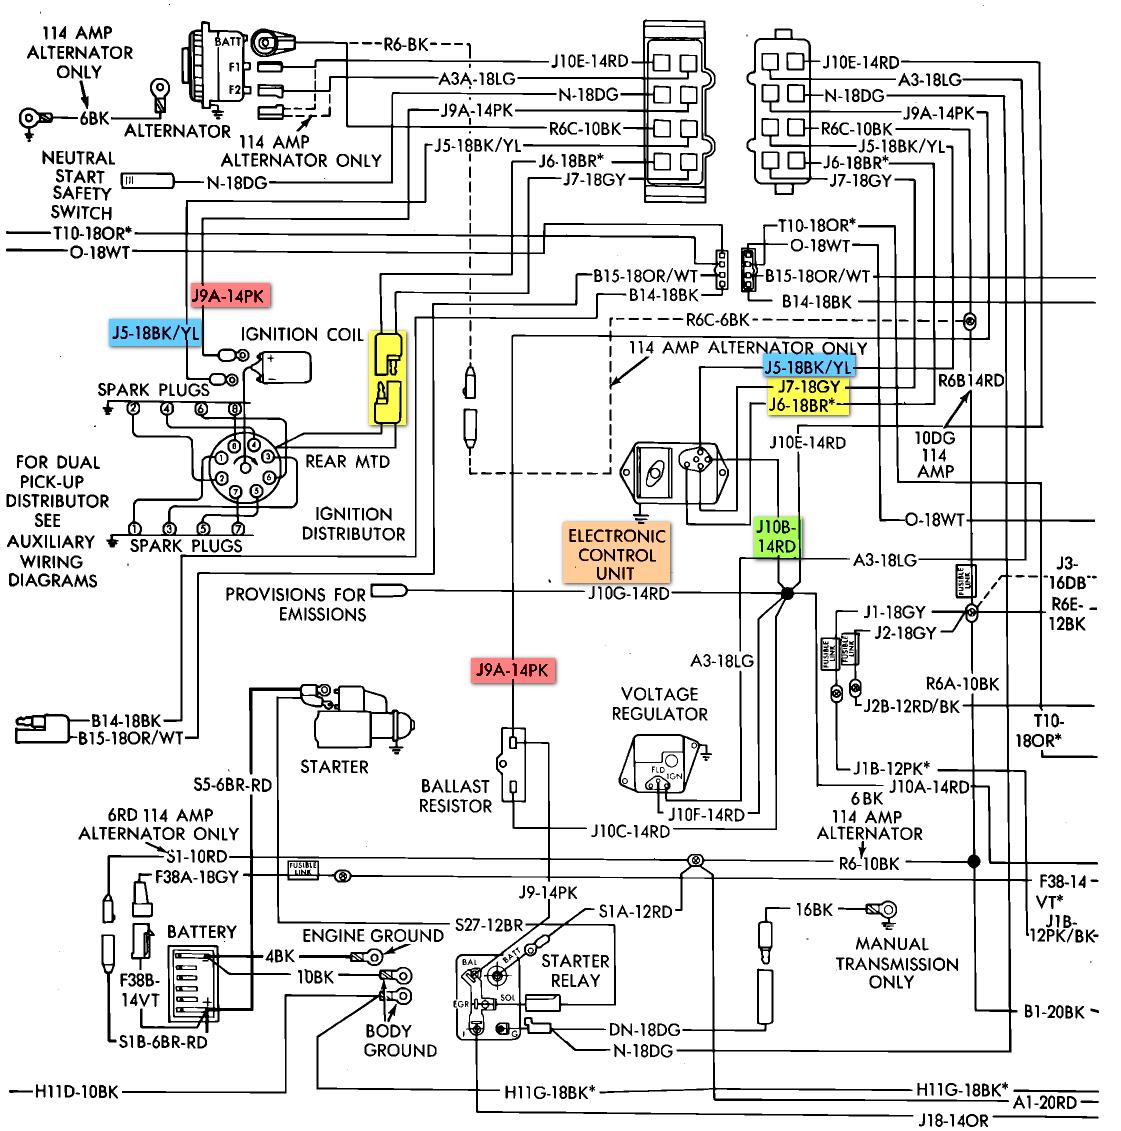 Winnebago Wiring Harness | Manual E-Books - Winnebago Motorhome Wiring Diagram